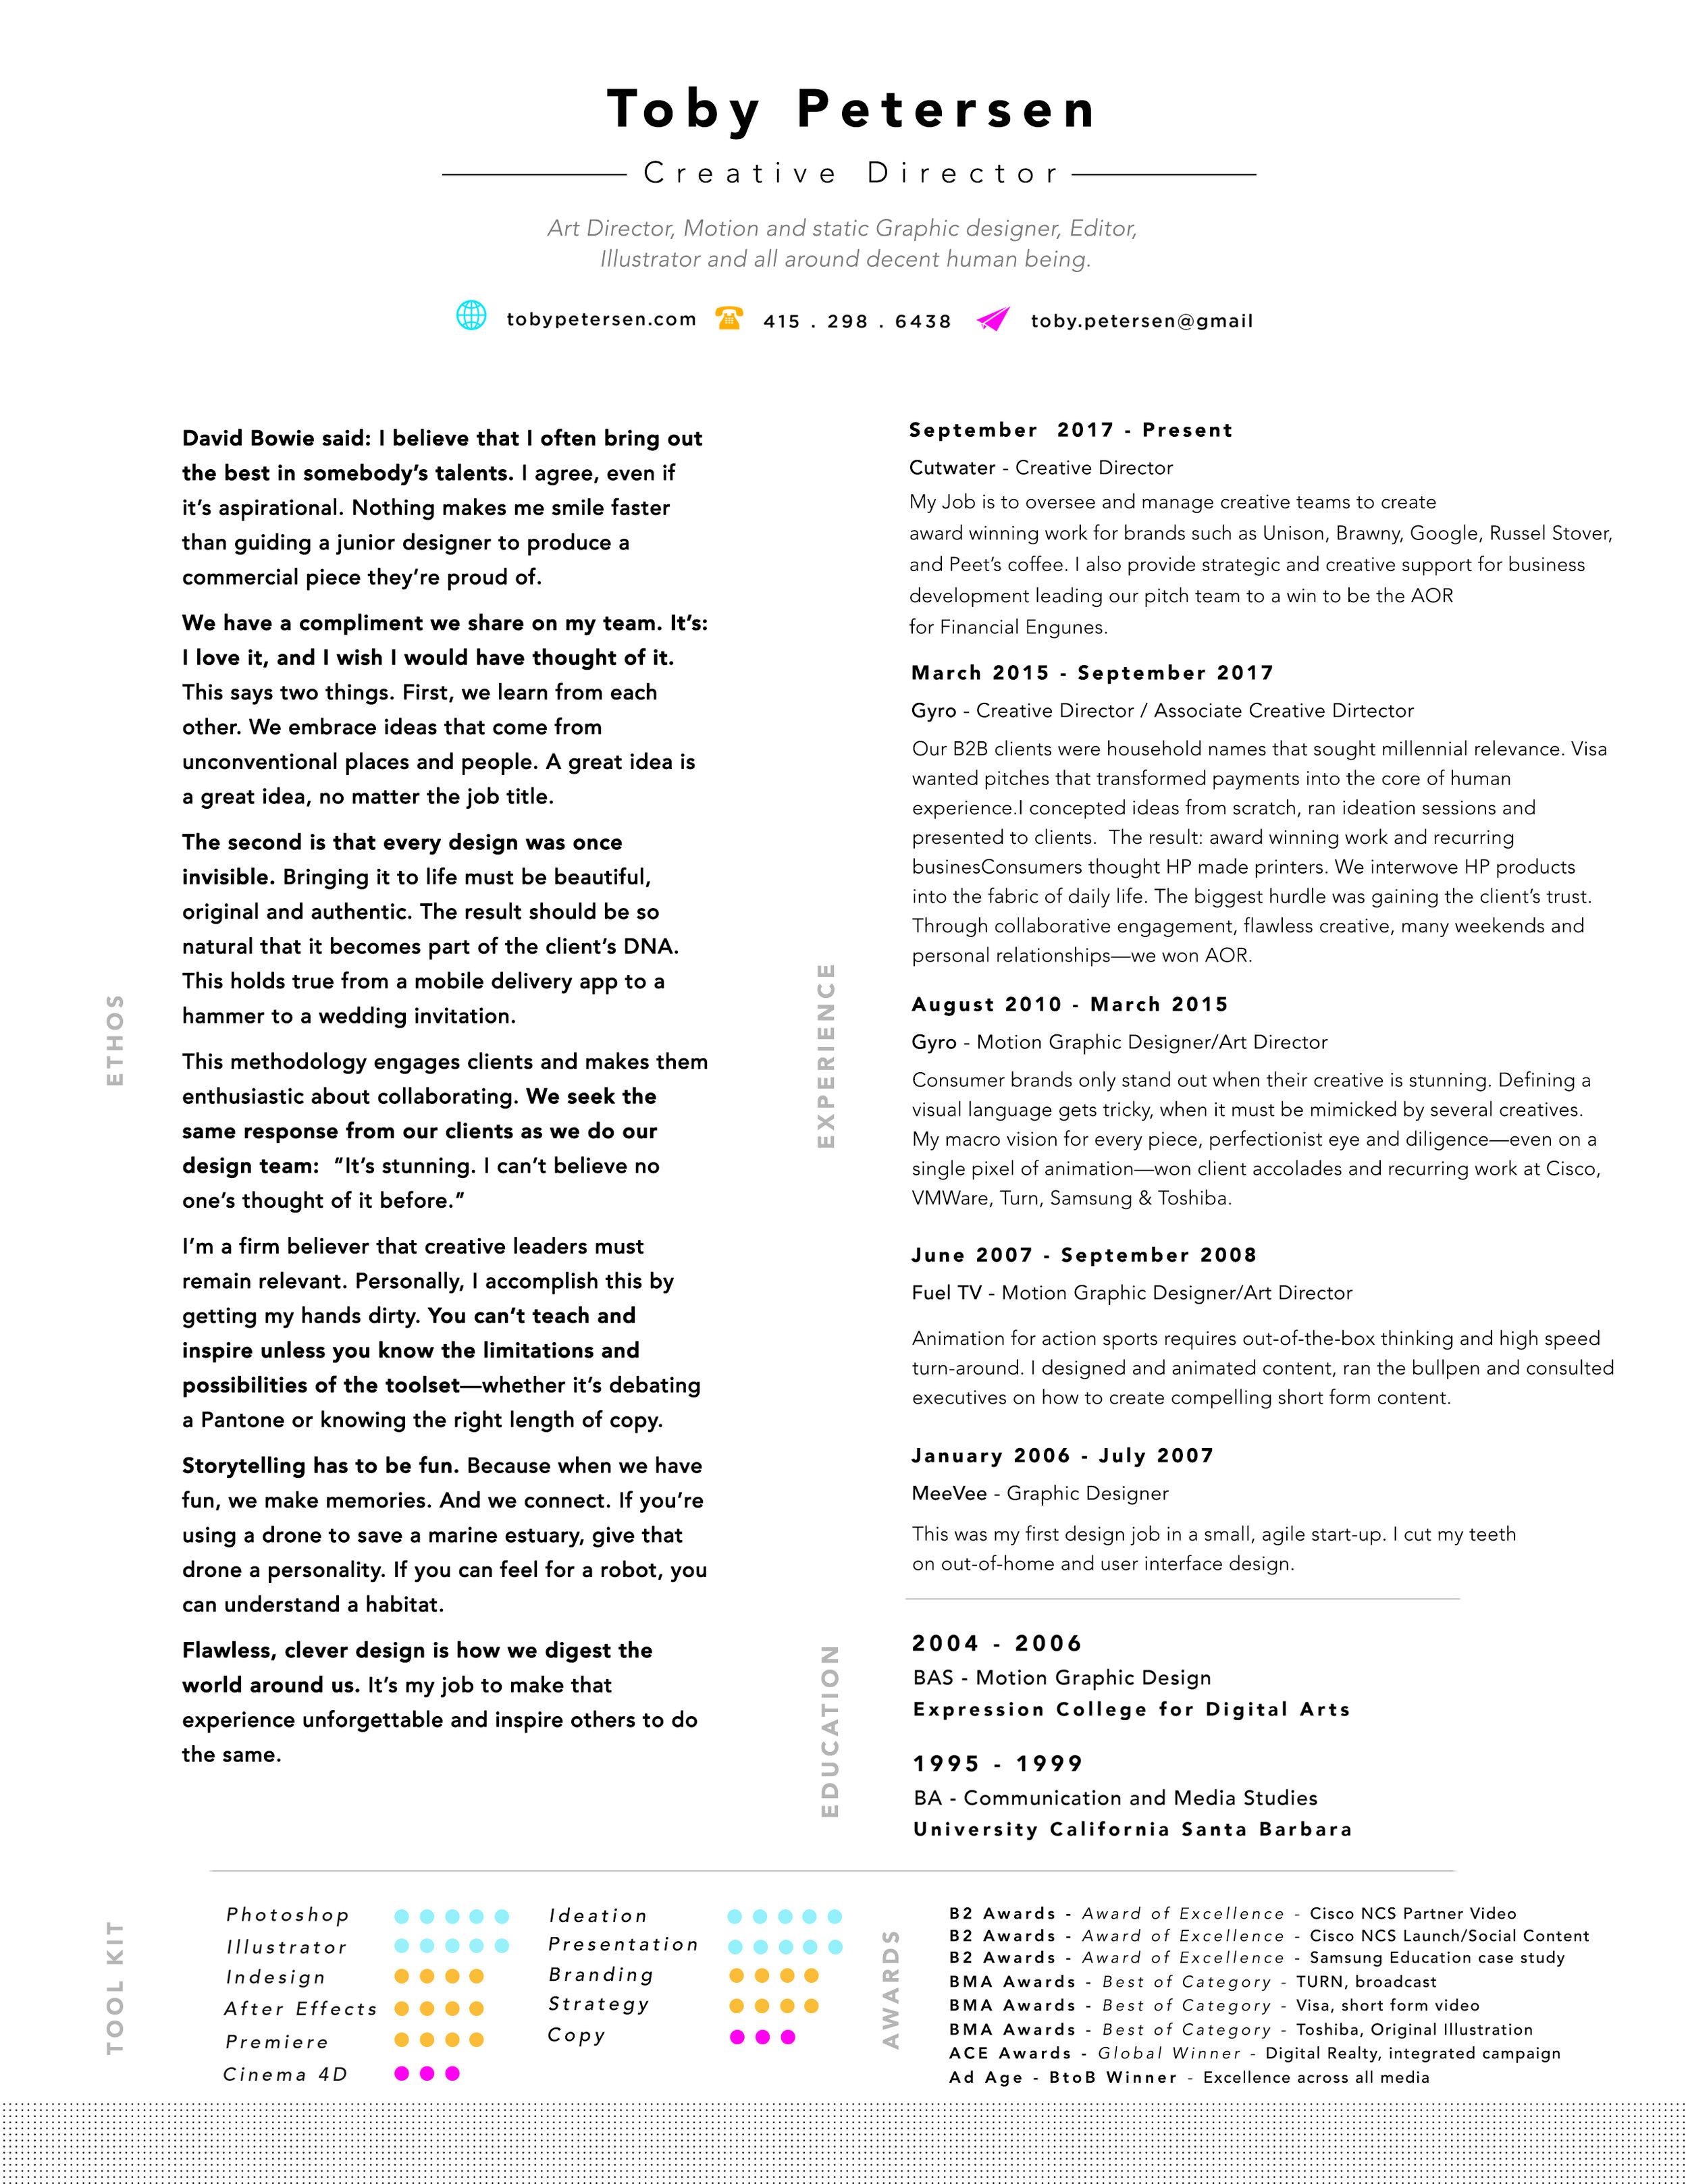 resume_2019_small.jpg